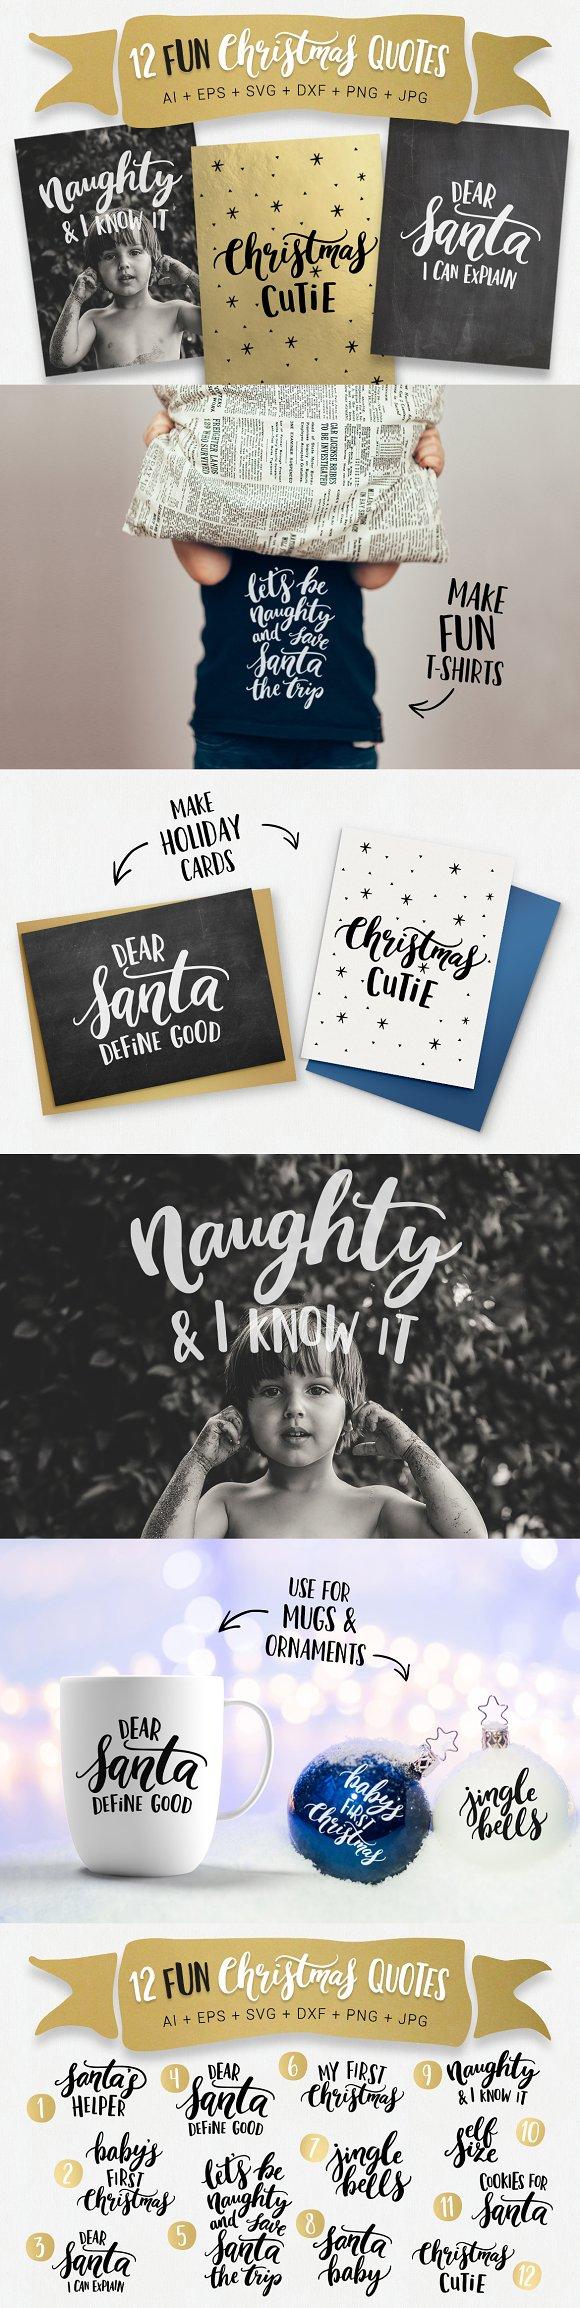 12 fun Christmas quotes, svg, vector